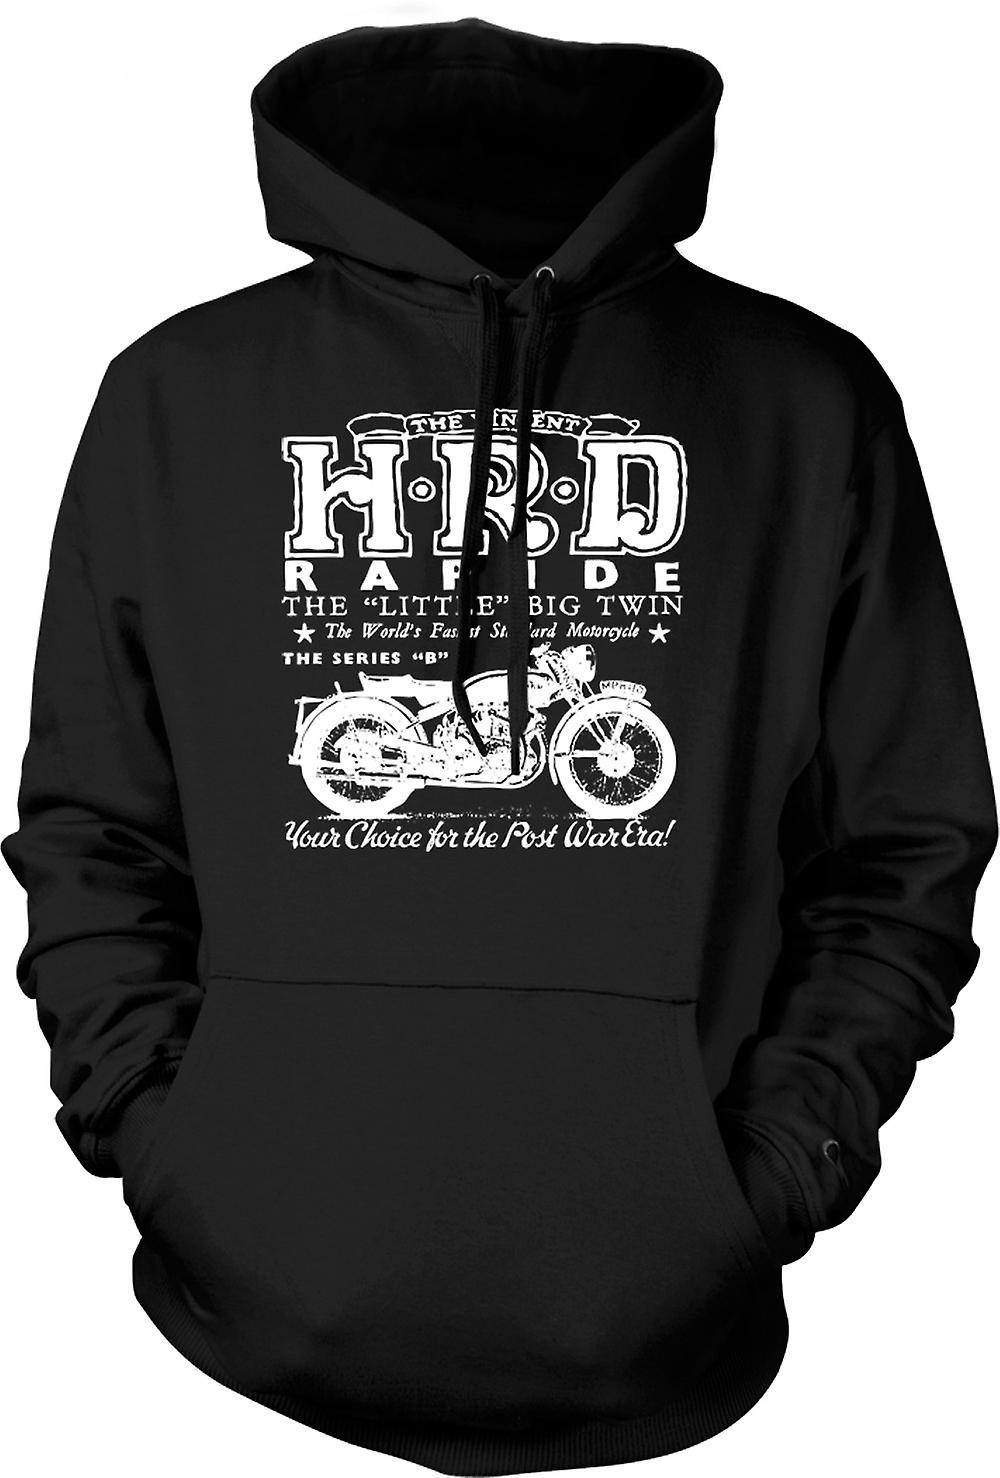 Mens Hoodie - Vincent Hrd Rapide - Classic Bike